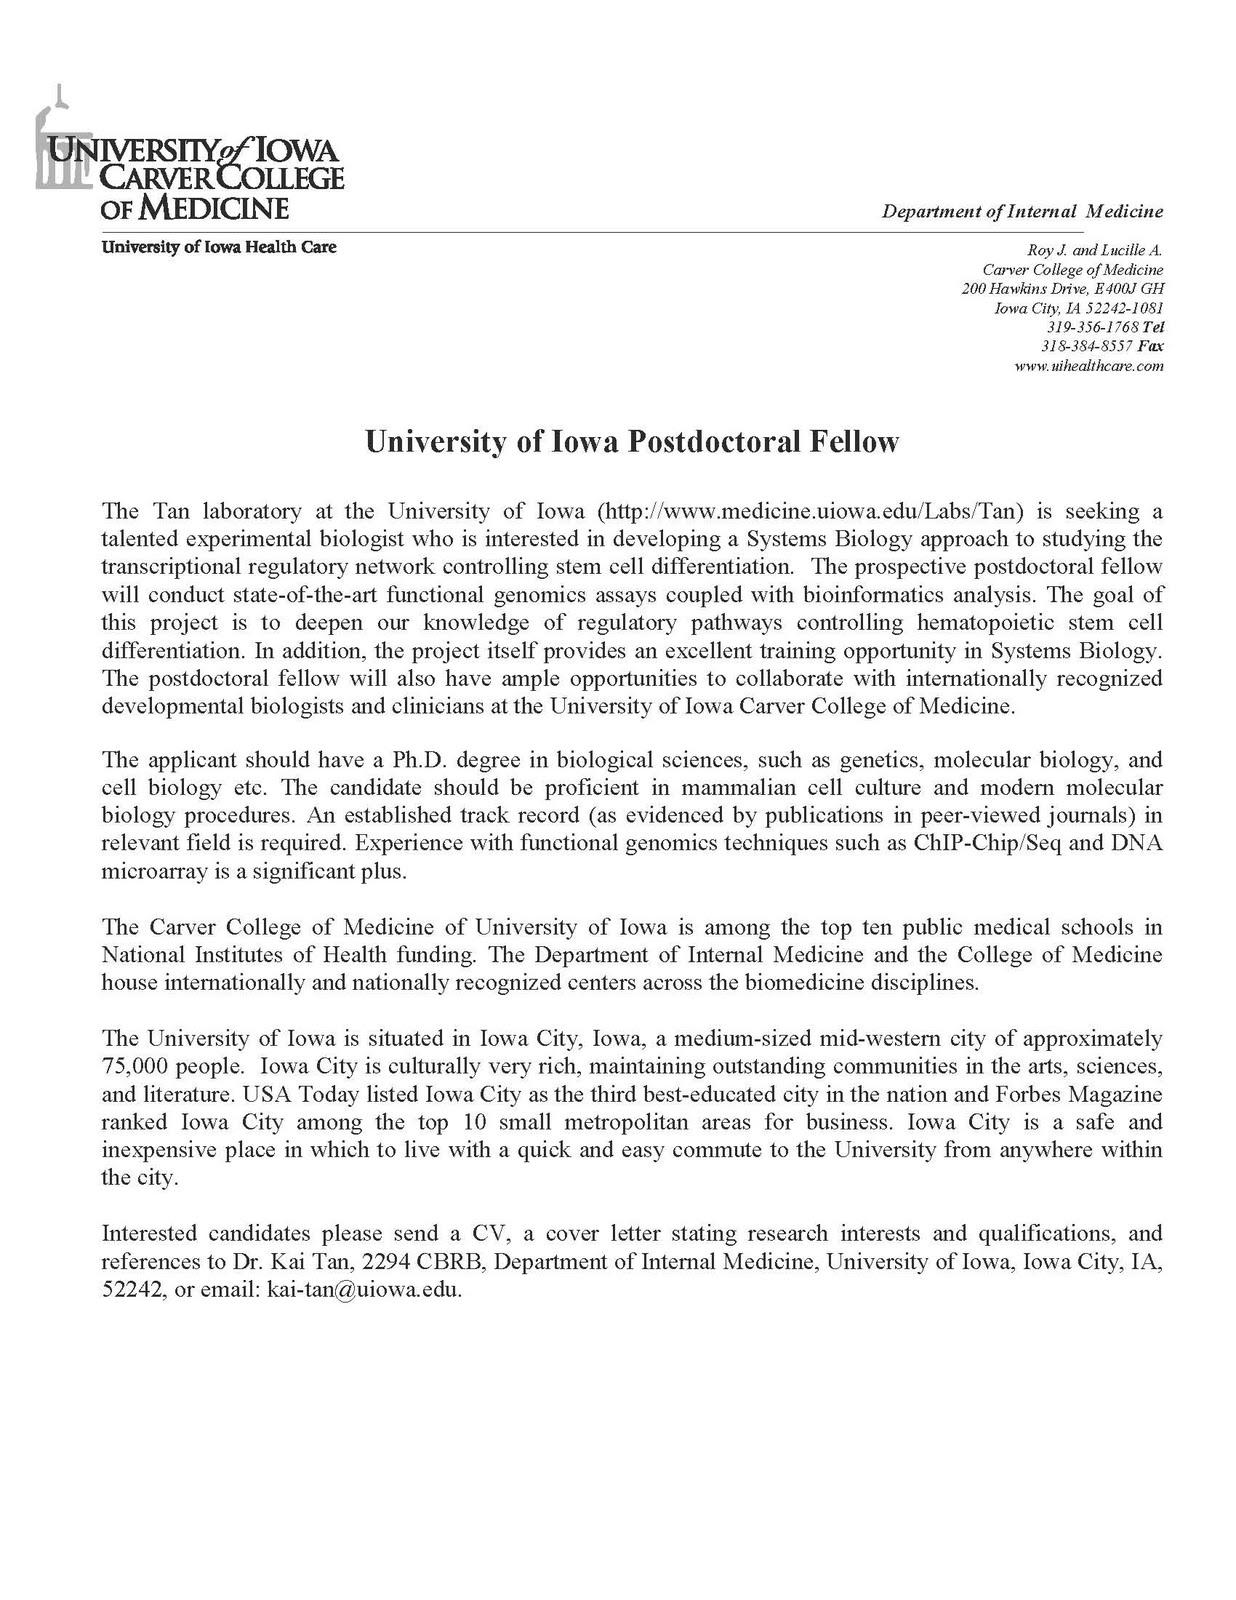 Applying for a Postdoctoral Position: A Stark Presentation